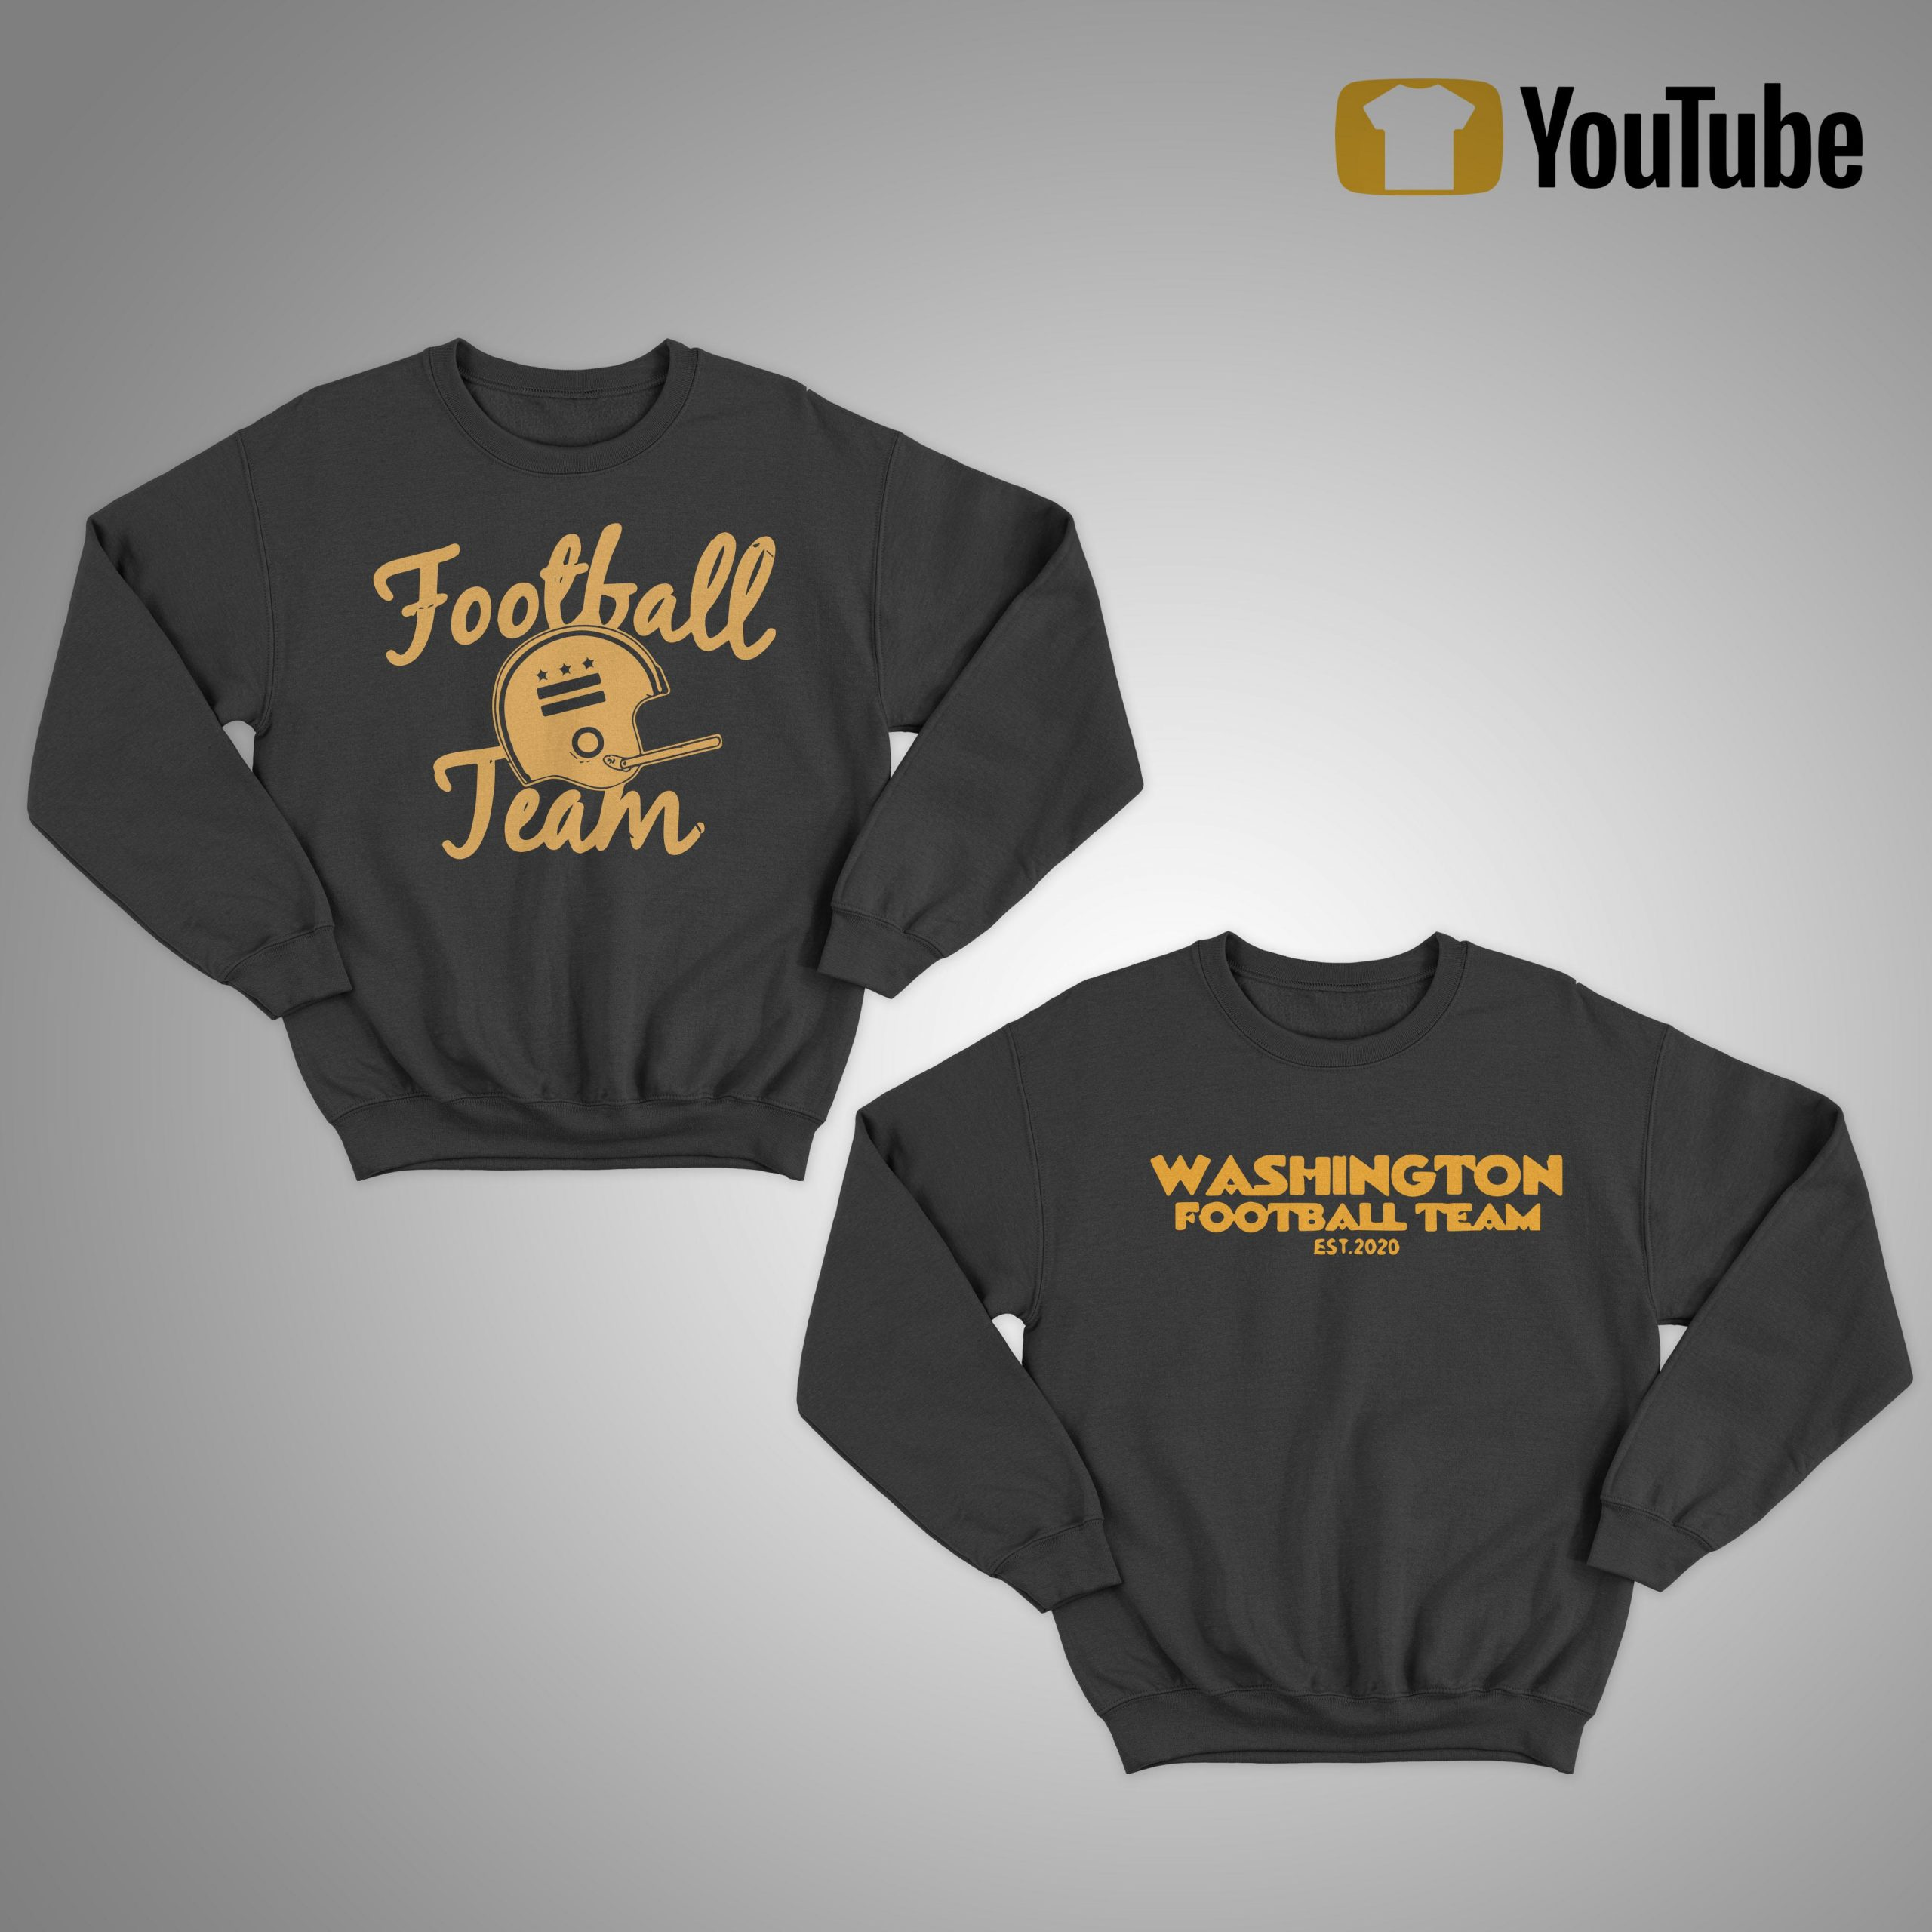 Washington Football Team Sweater